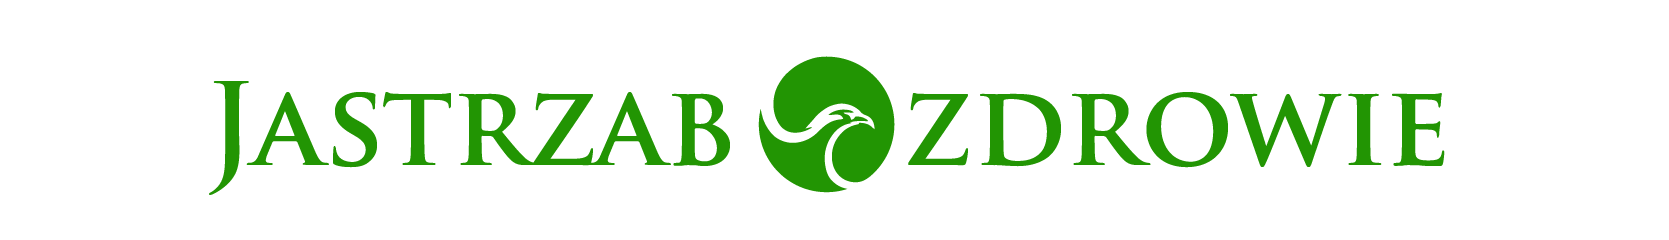 Jastrząb Post - logo